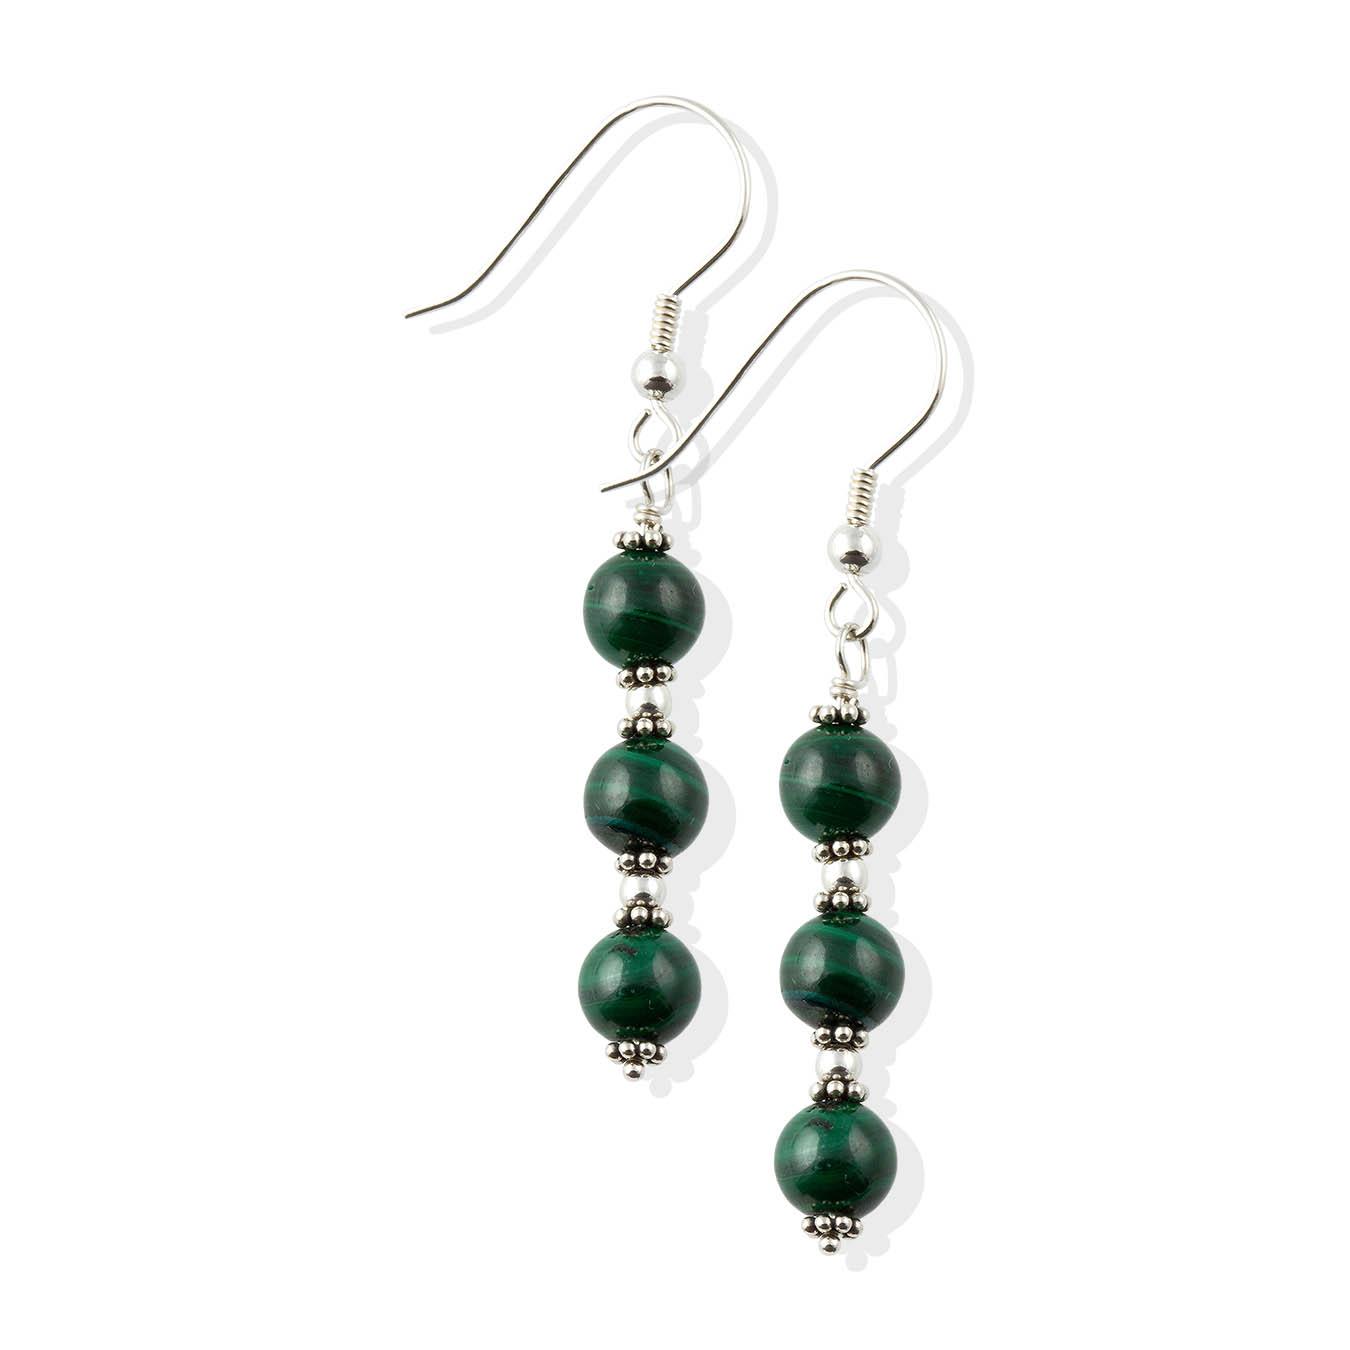 Handmade malachite gemstones jewelry necklace with bali silver beads